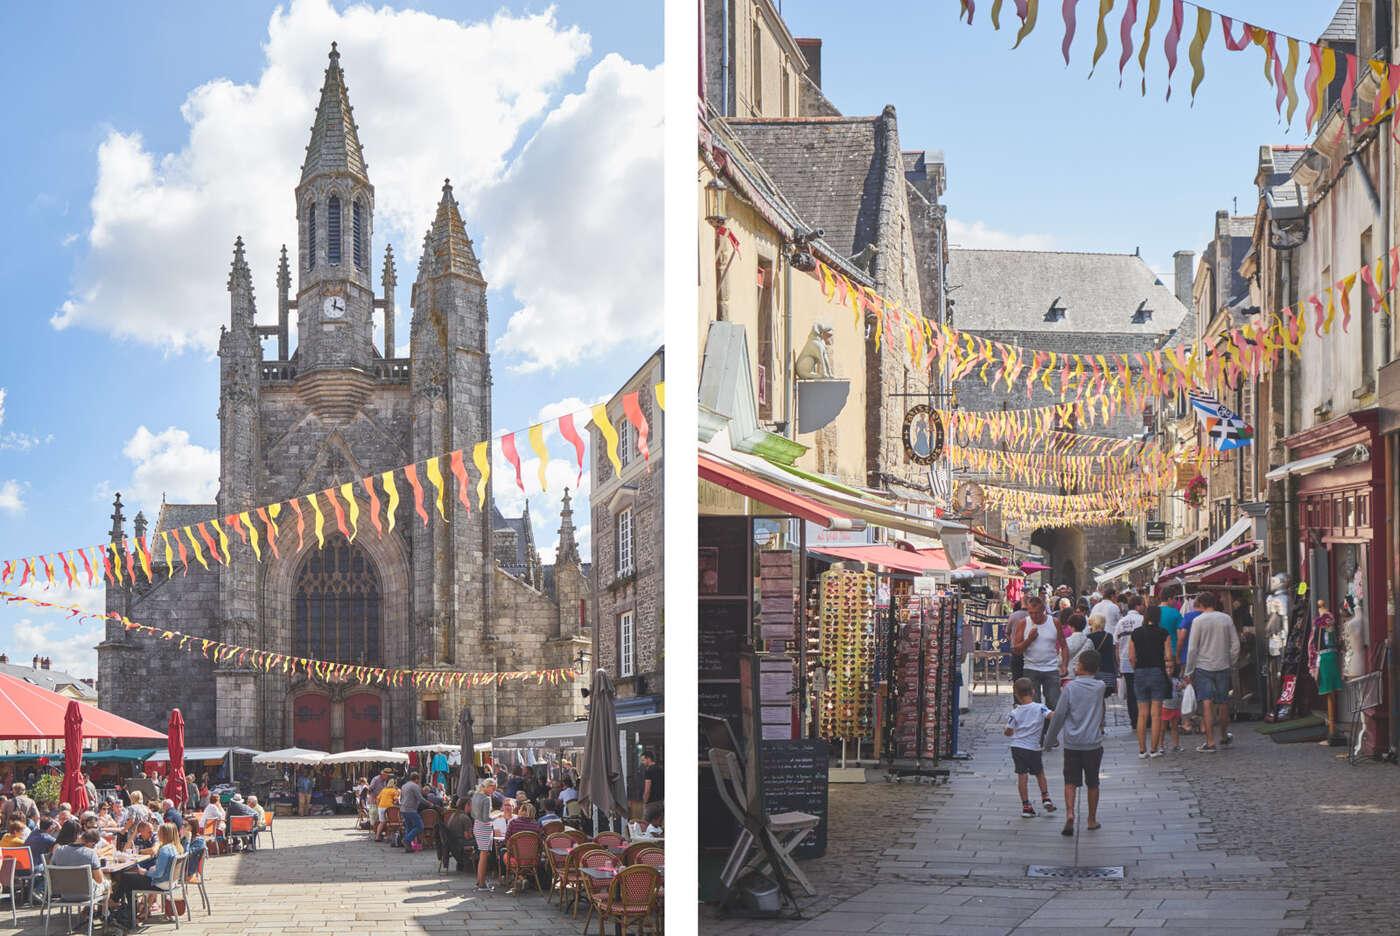 Marché de Guérande